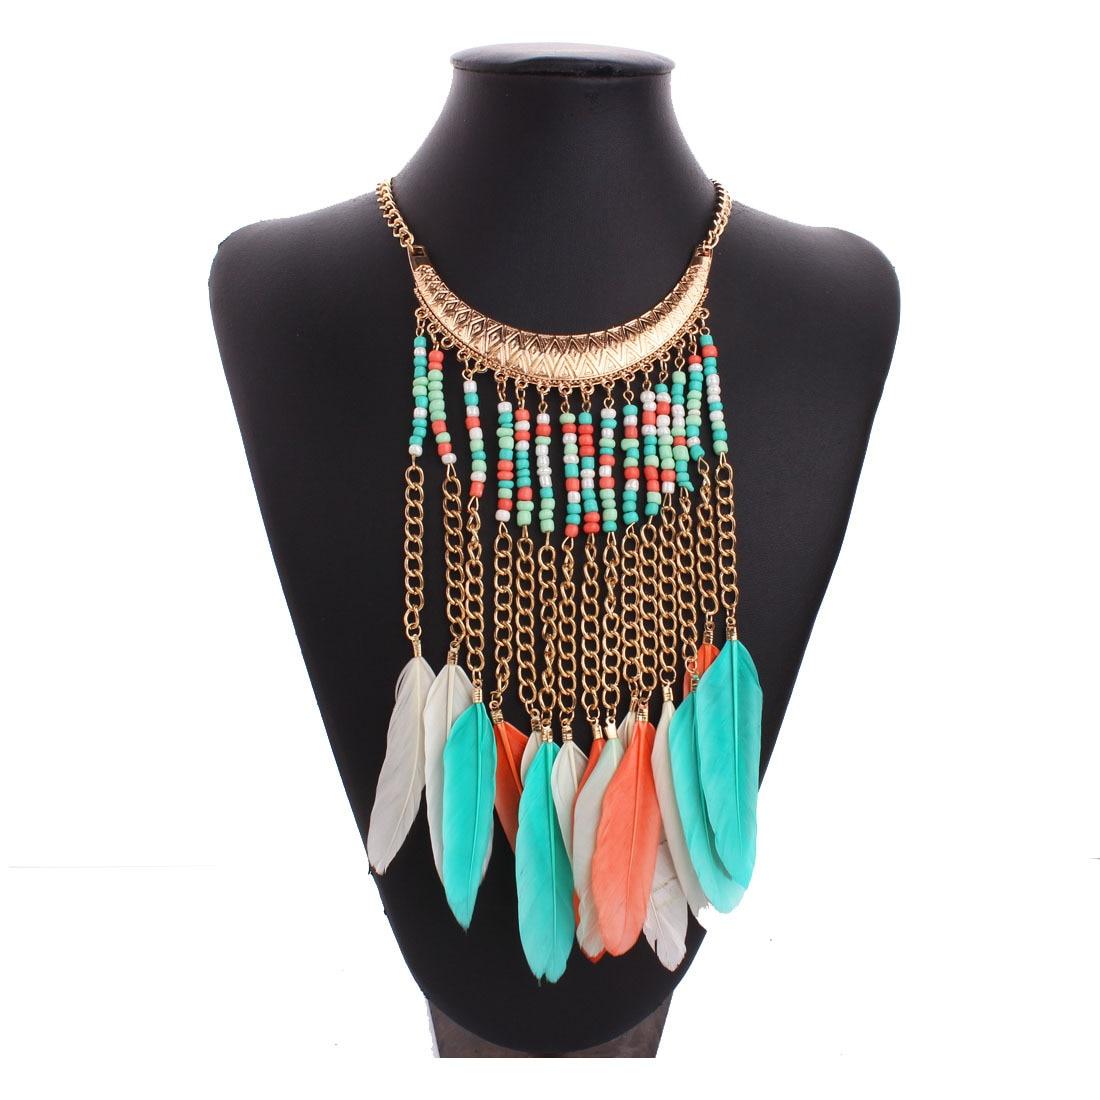 Zinc Alloy Beads Long Tassel Feather Necklace Choker Fashion Party Bohemian Necklaces Women Jewelry Collares De Plumas Colors